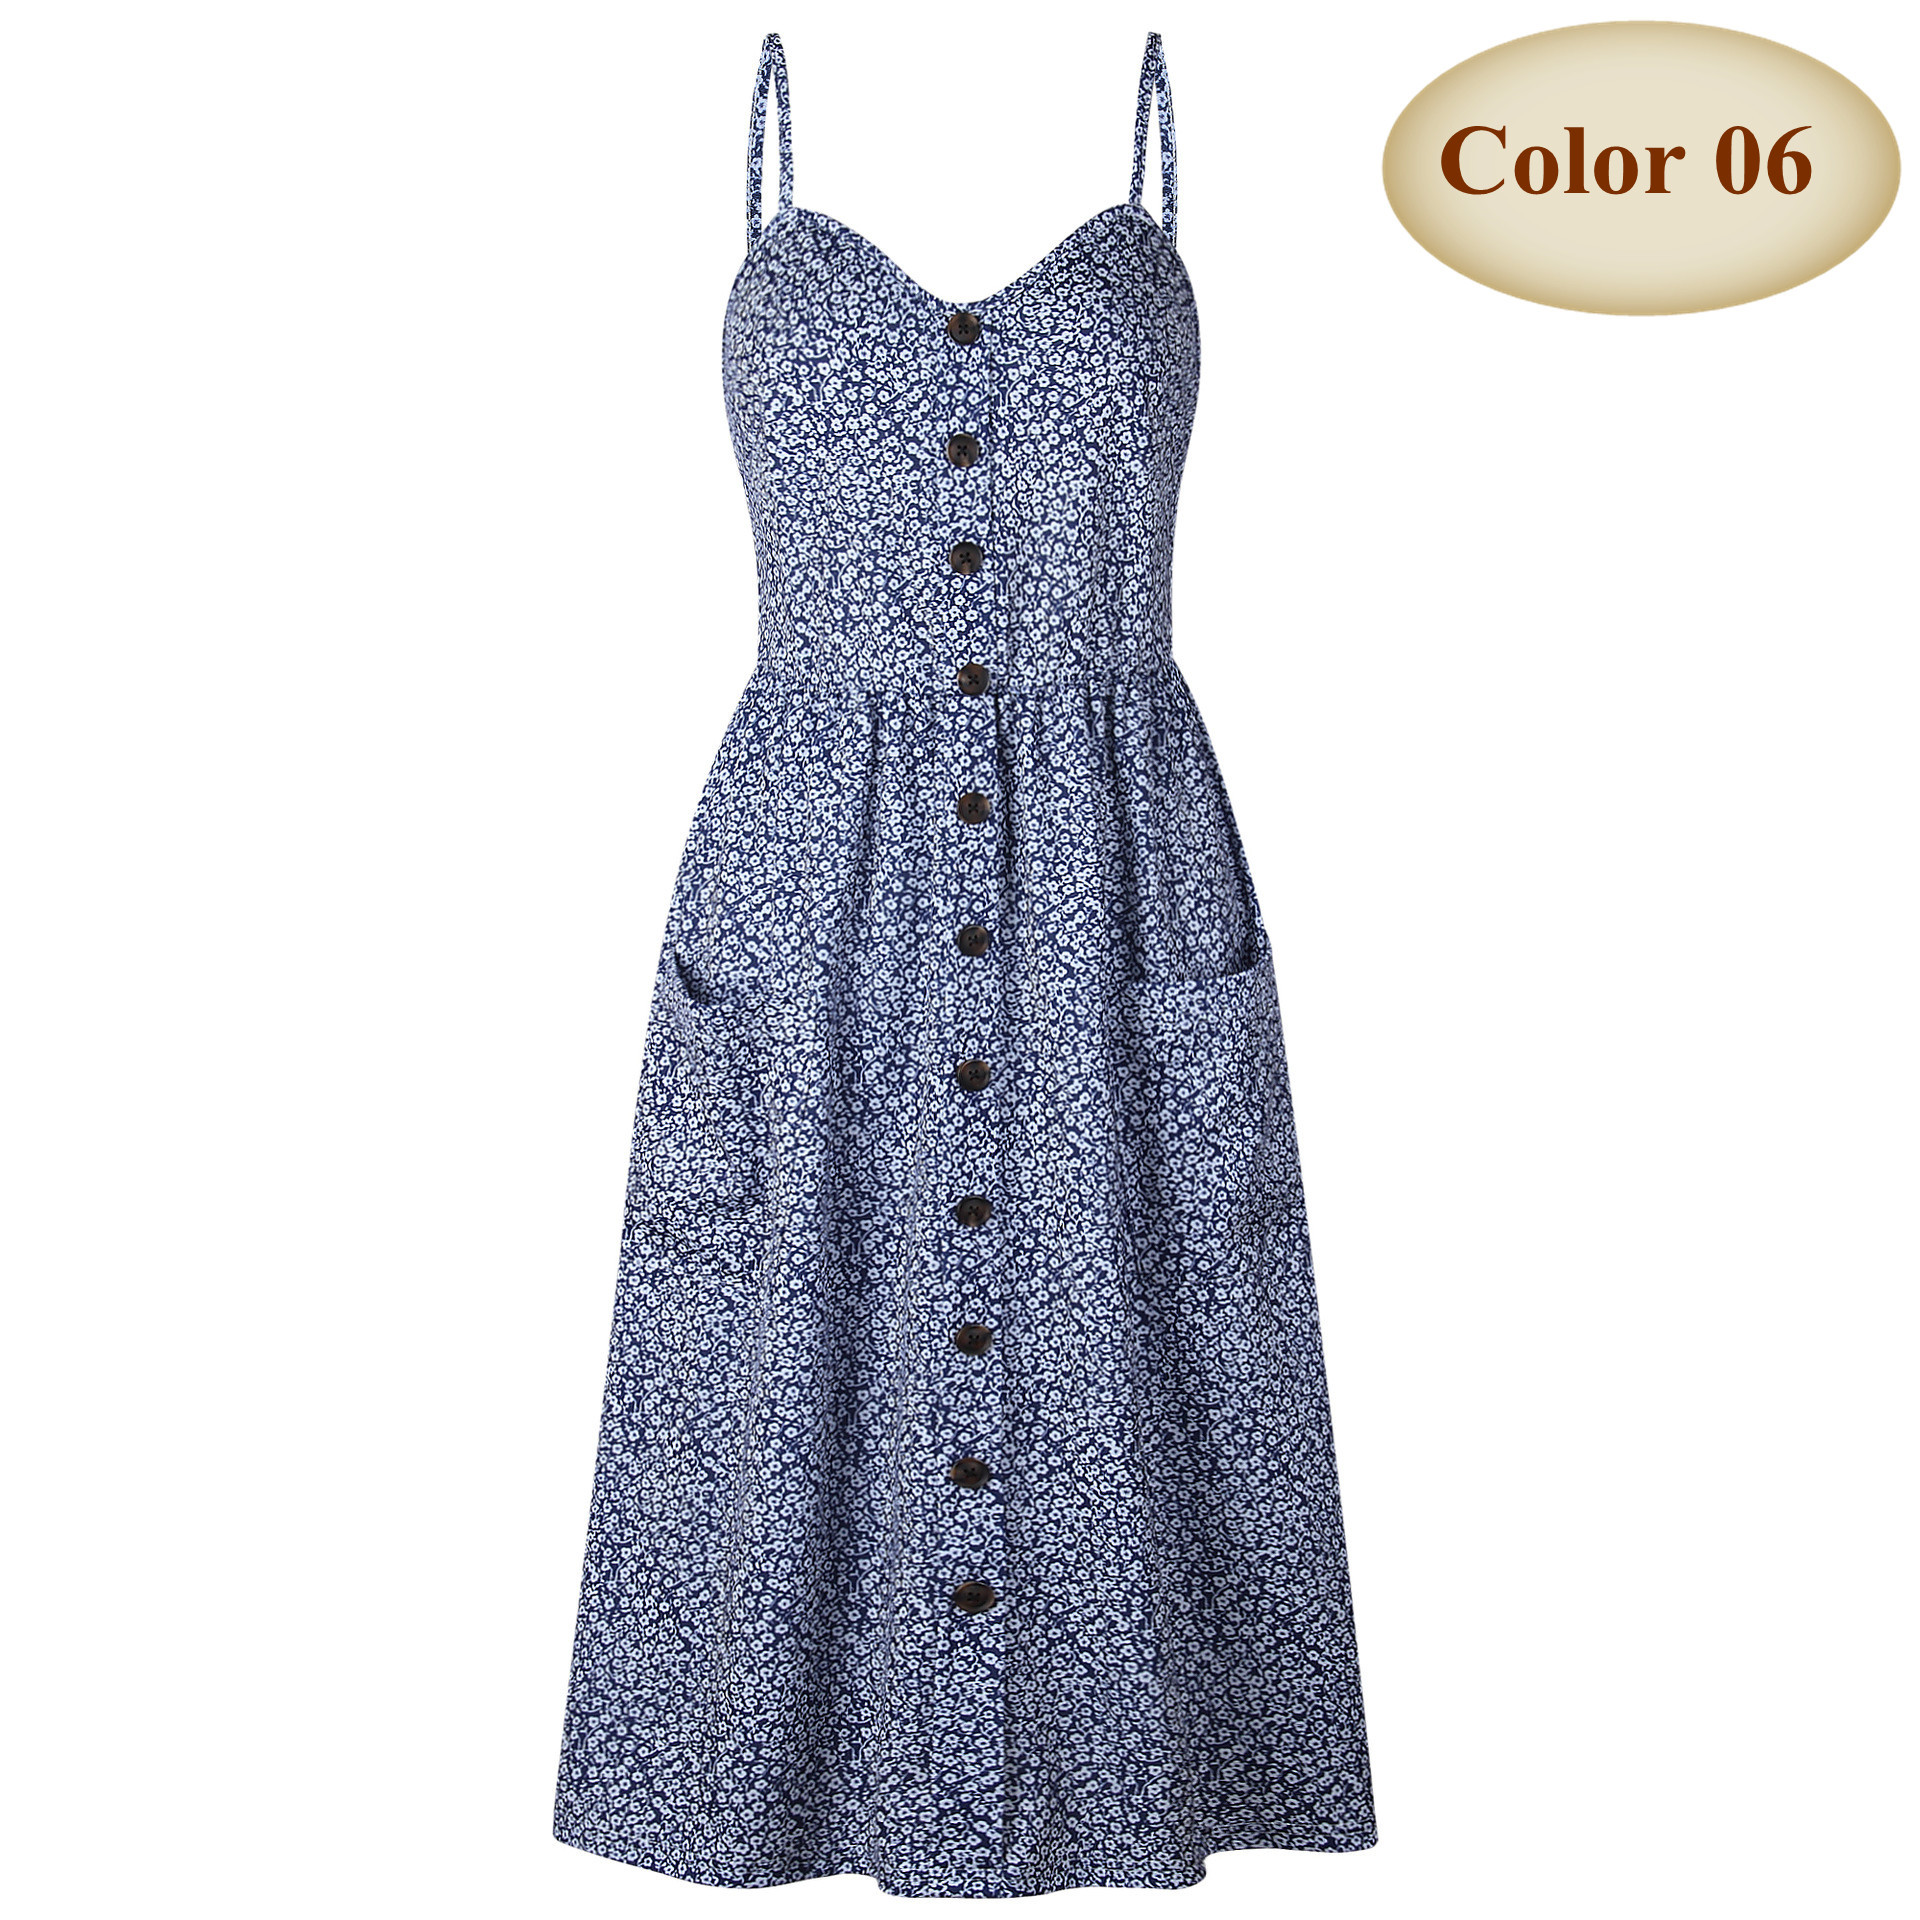 New Boho Off-shoulder Party Beach Sundress Spaghetti Long Dresses Plus Size Summer Women Button Decorated Print Dress CRRIFLZ 18